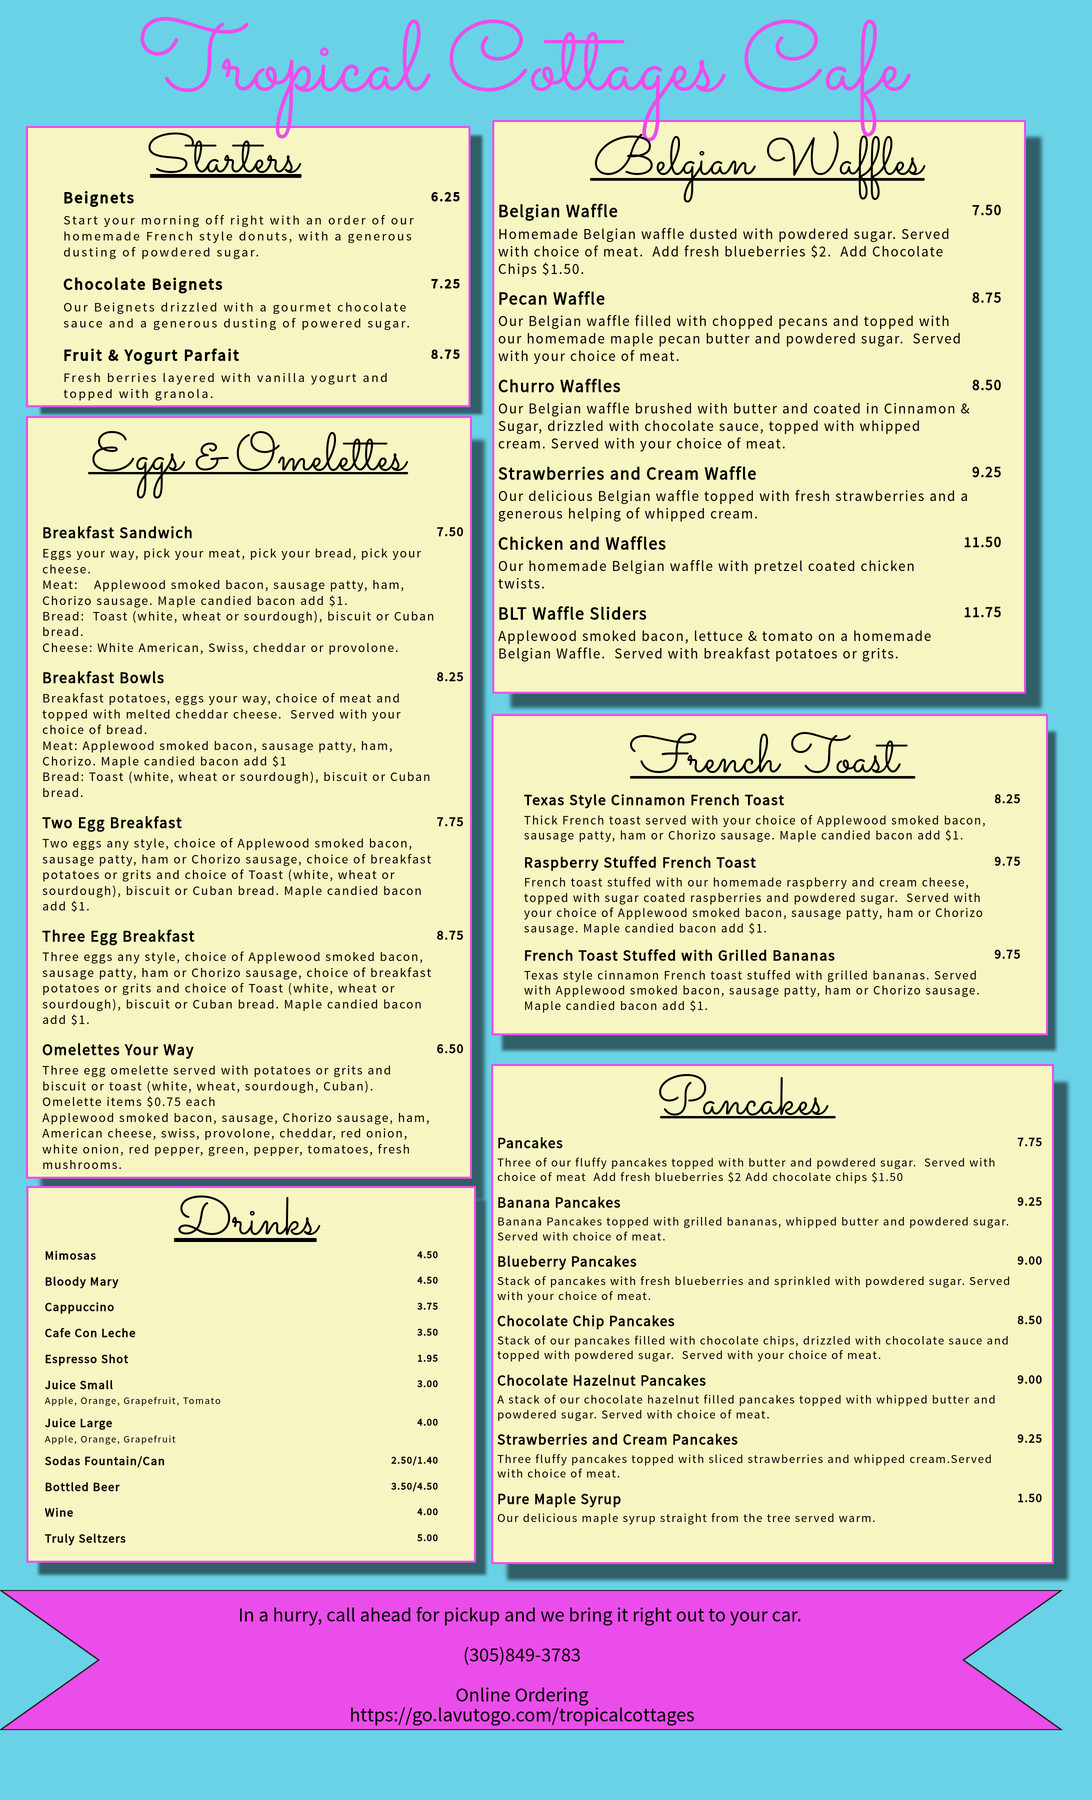 Tropical Cottages Cafe Breakfast Menu (1